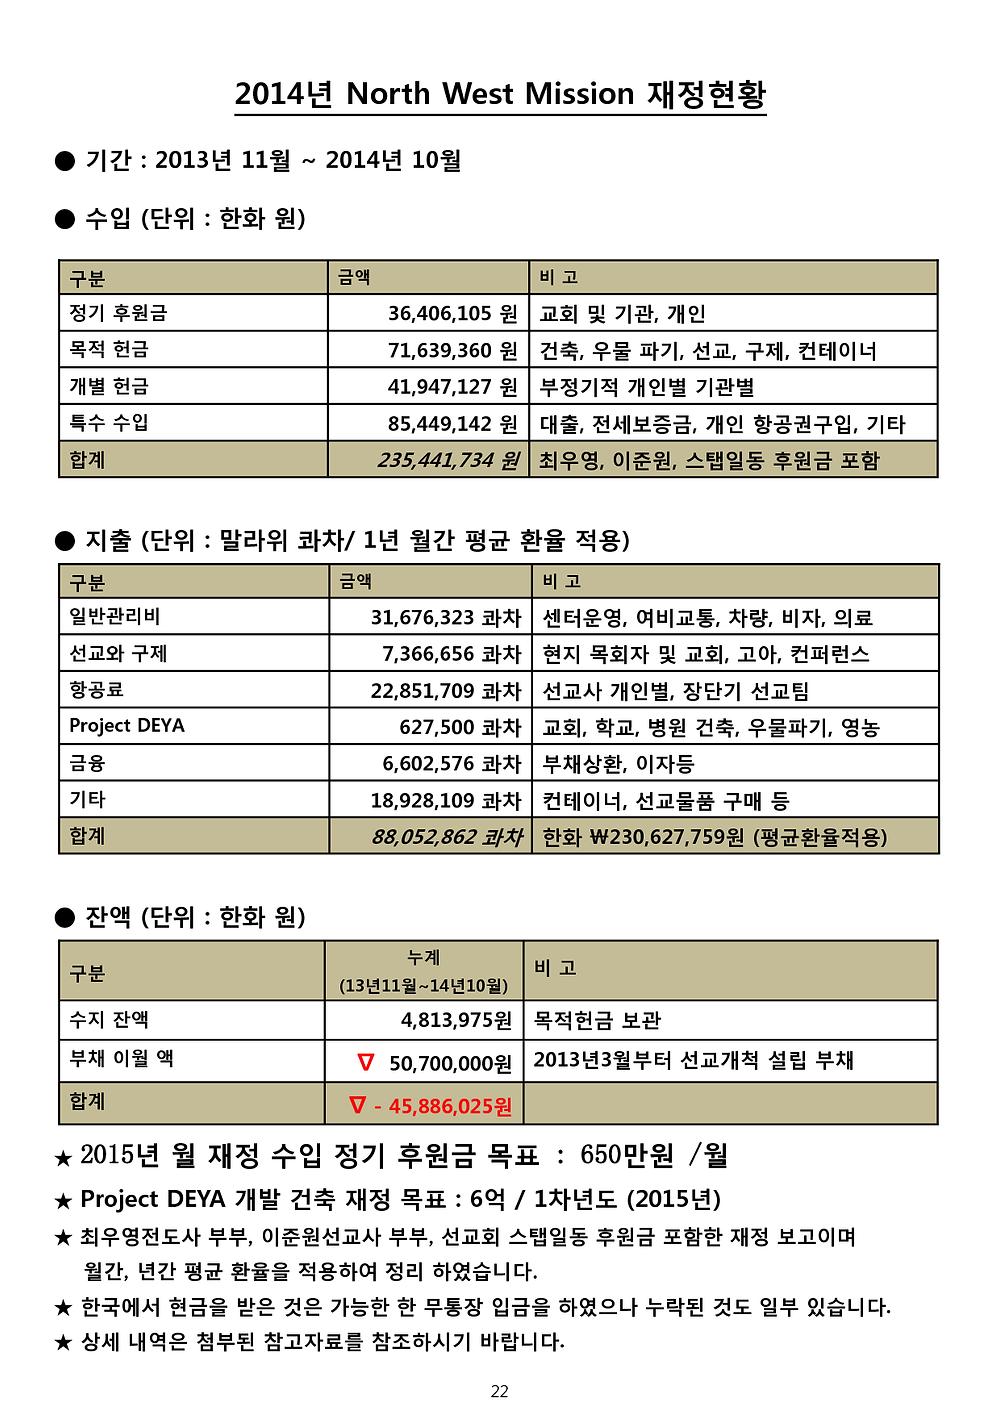 NWM 2014년 선교보고_22.png